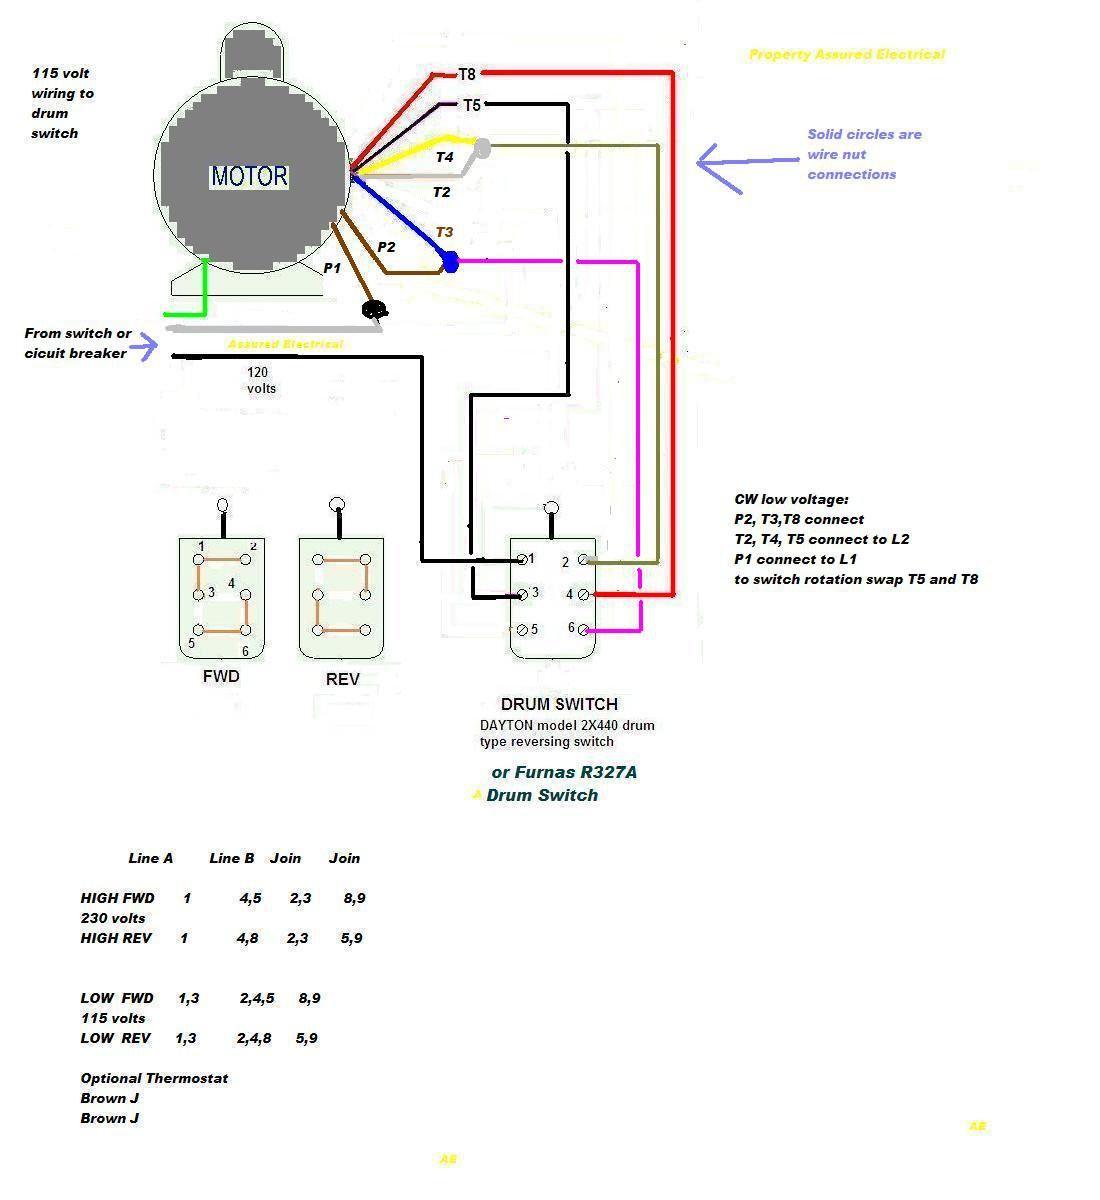 2014 02 05 Drum2x440and Leesonr9 Lead Motor Jpg Resized665 2C725 To Dayton Gear Wiring Diagram